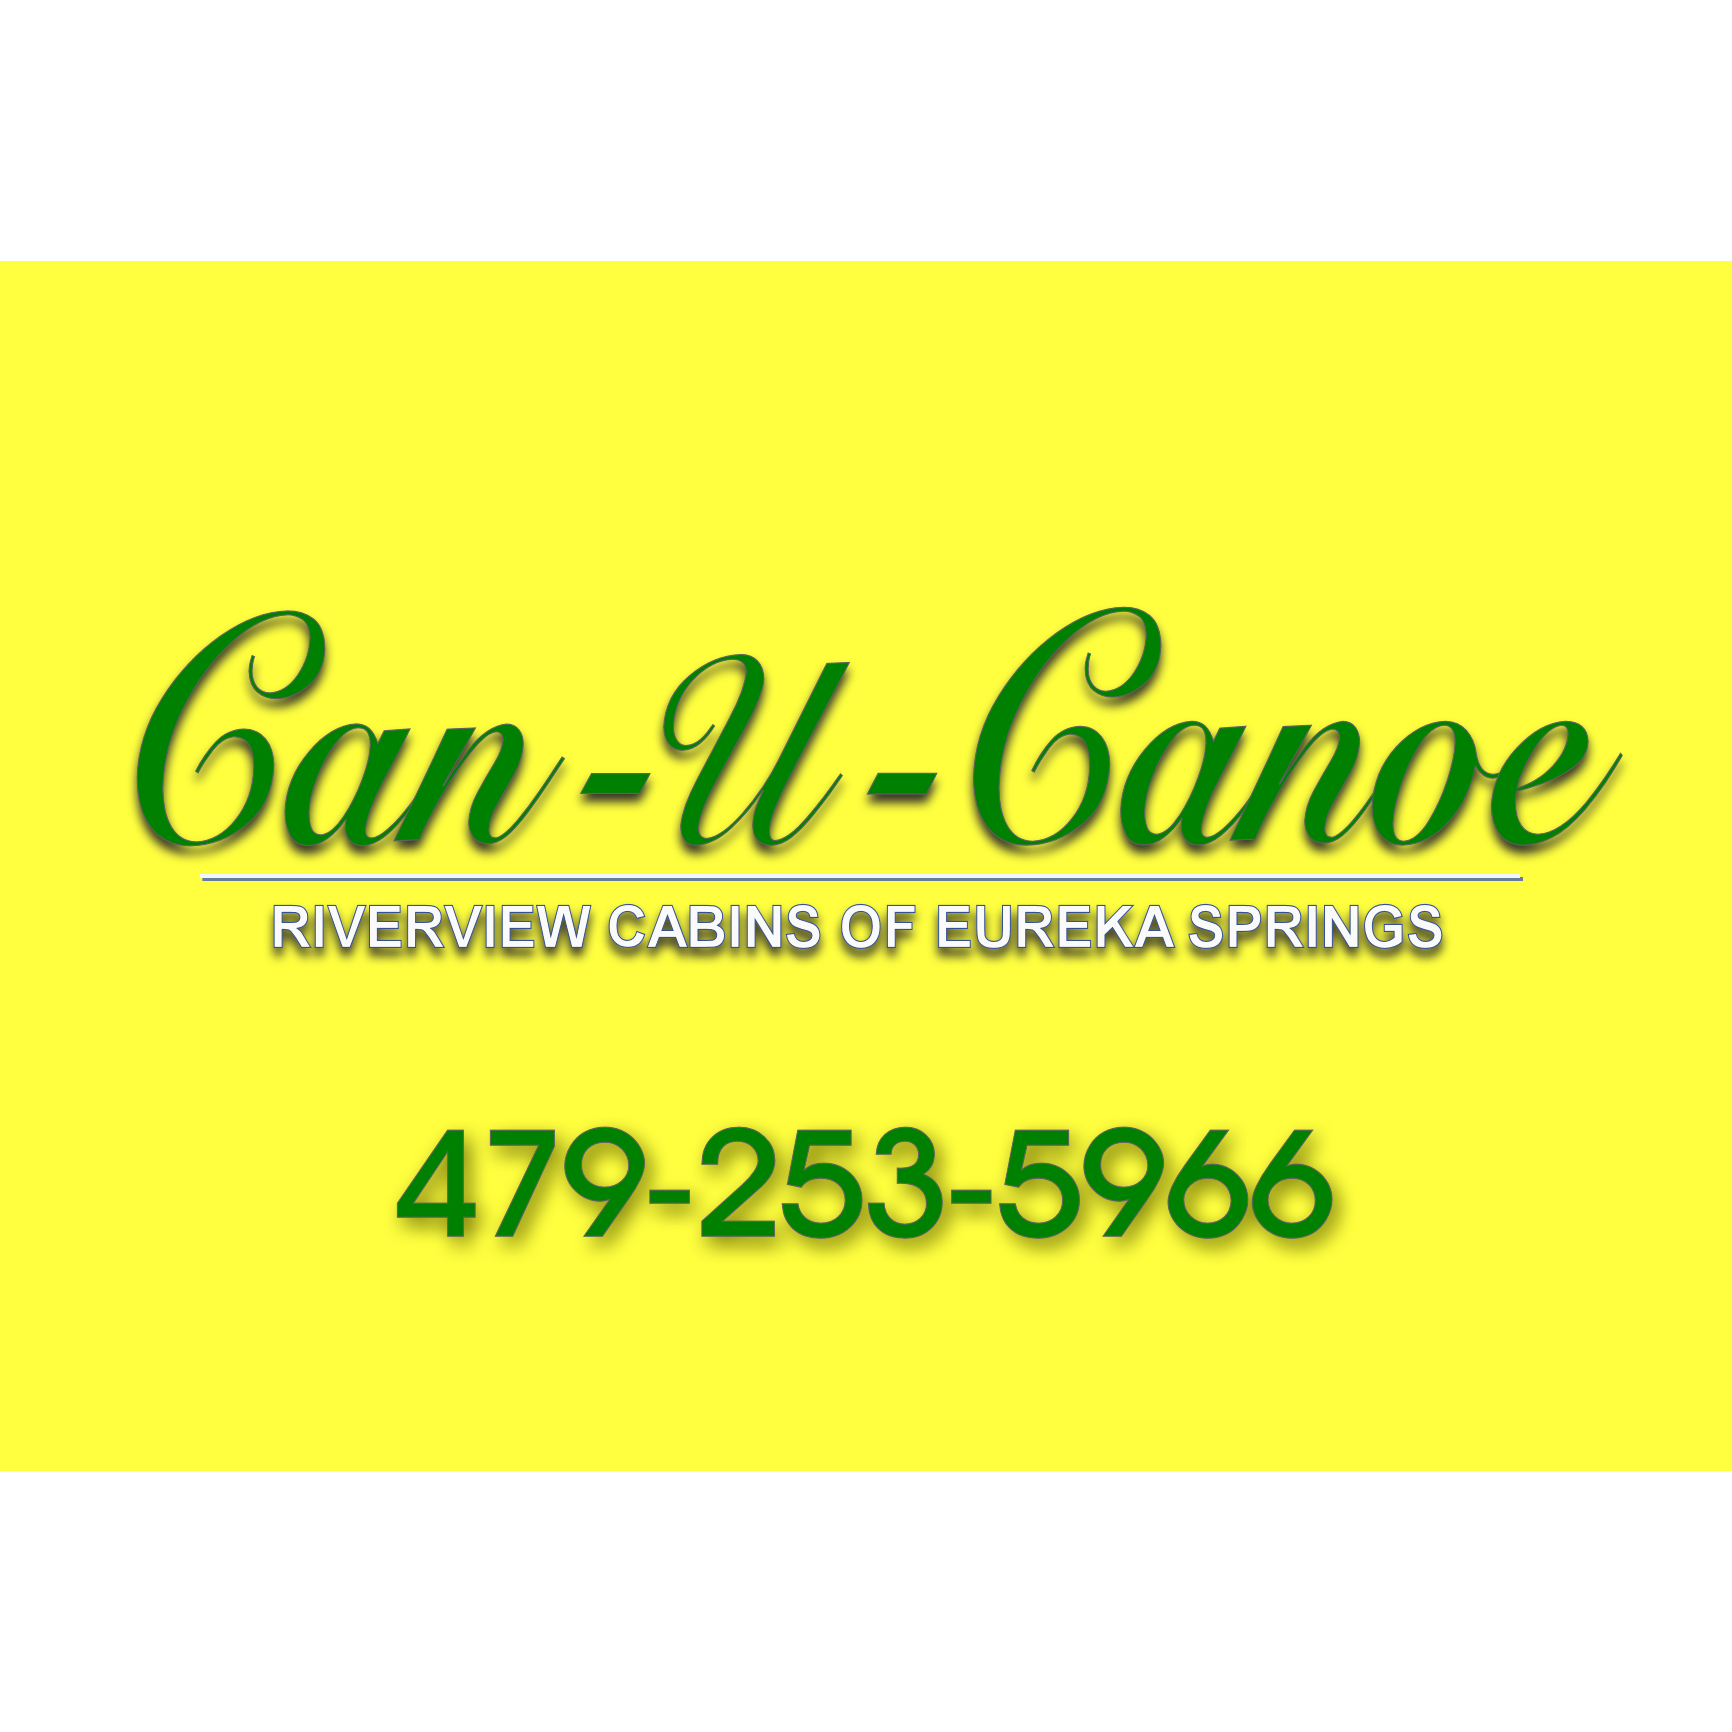 Can-U-Canoe Riverview Cabins - Eureka Springs, AR - Hotels & Motels